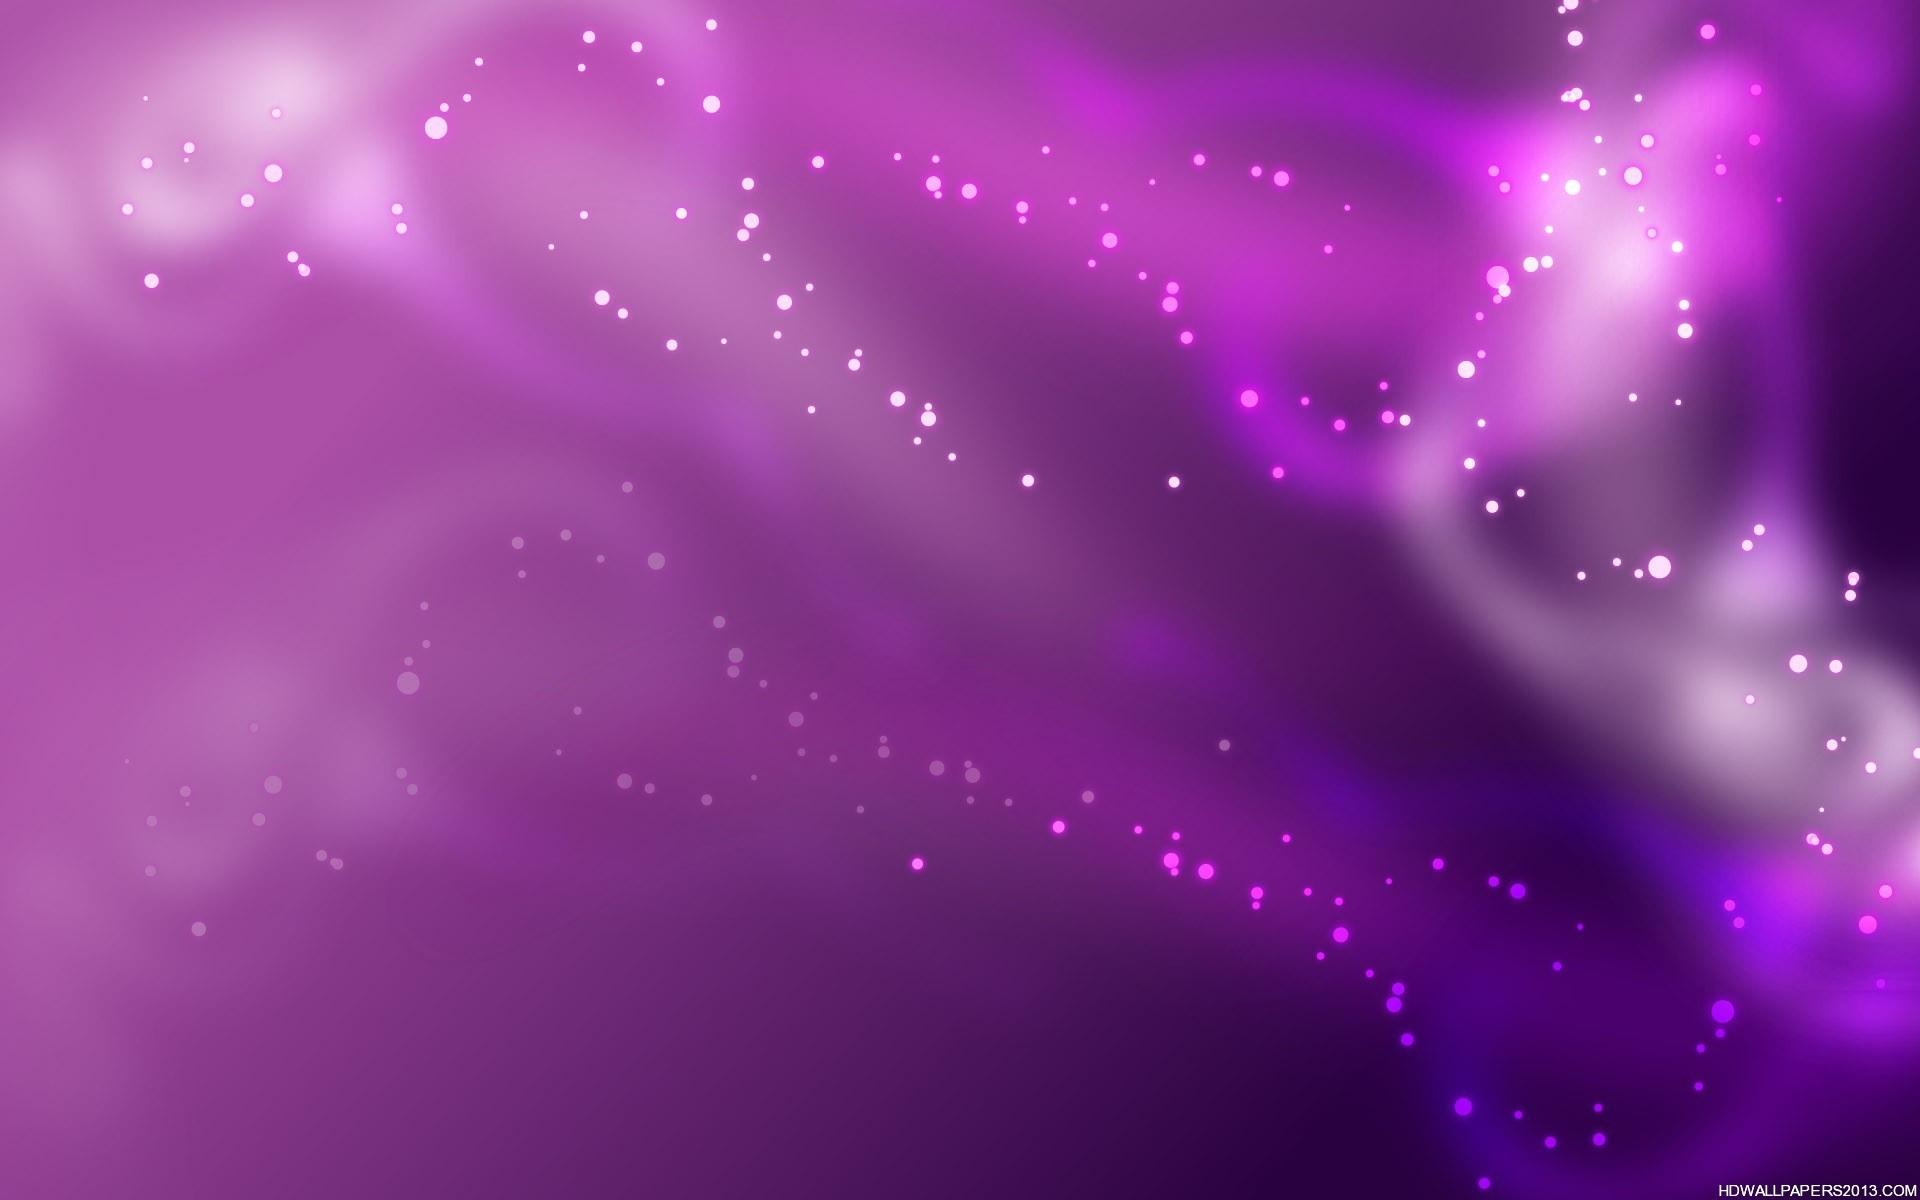 wallpaper hd hd wallpapers purple colorful wallpaper hd hd backgrounds 1920x1200